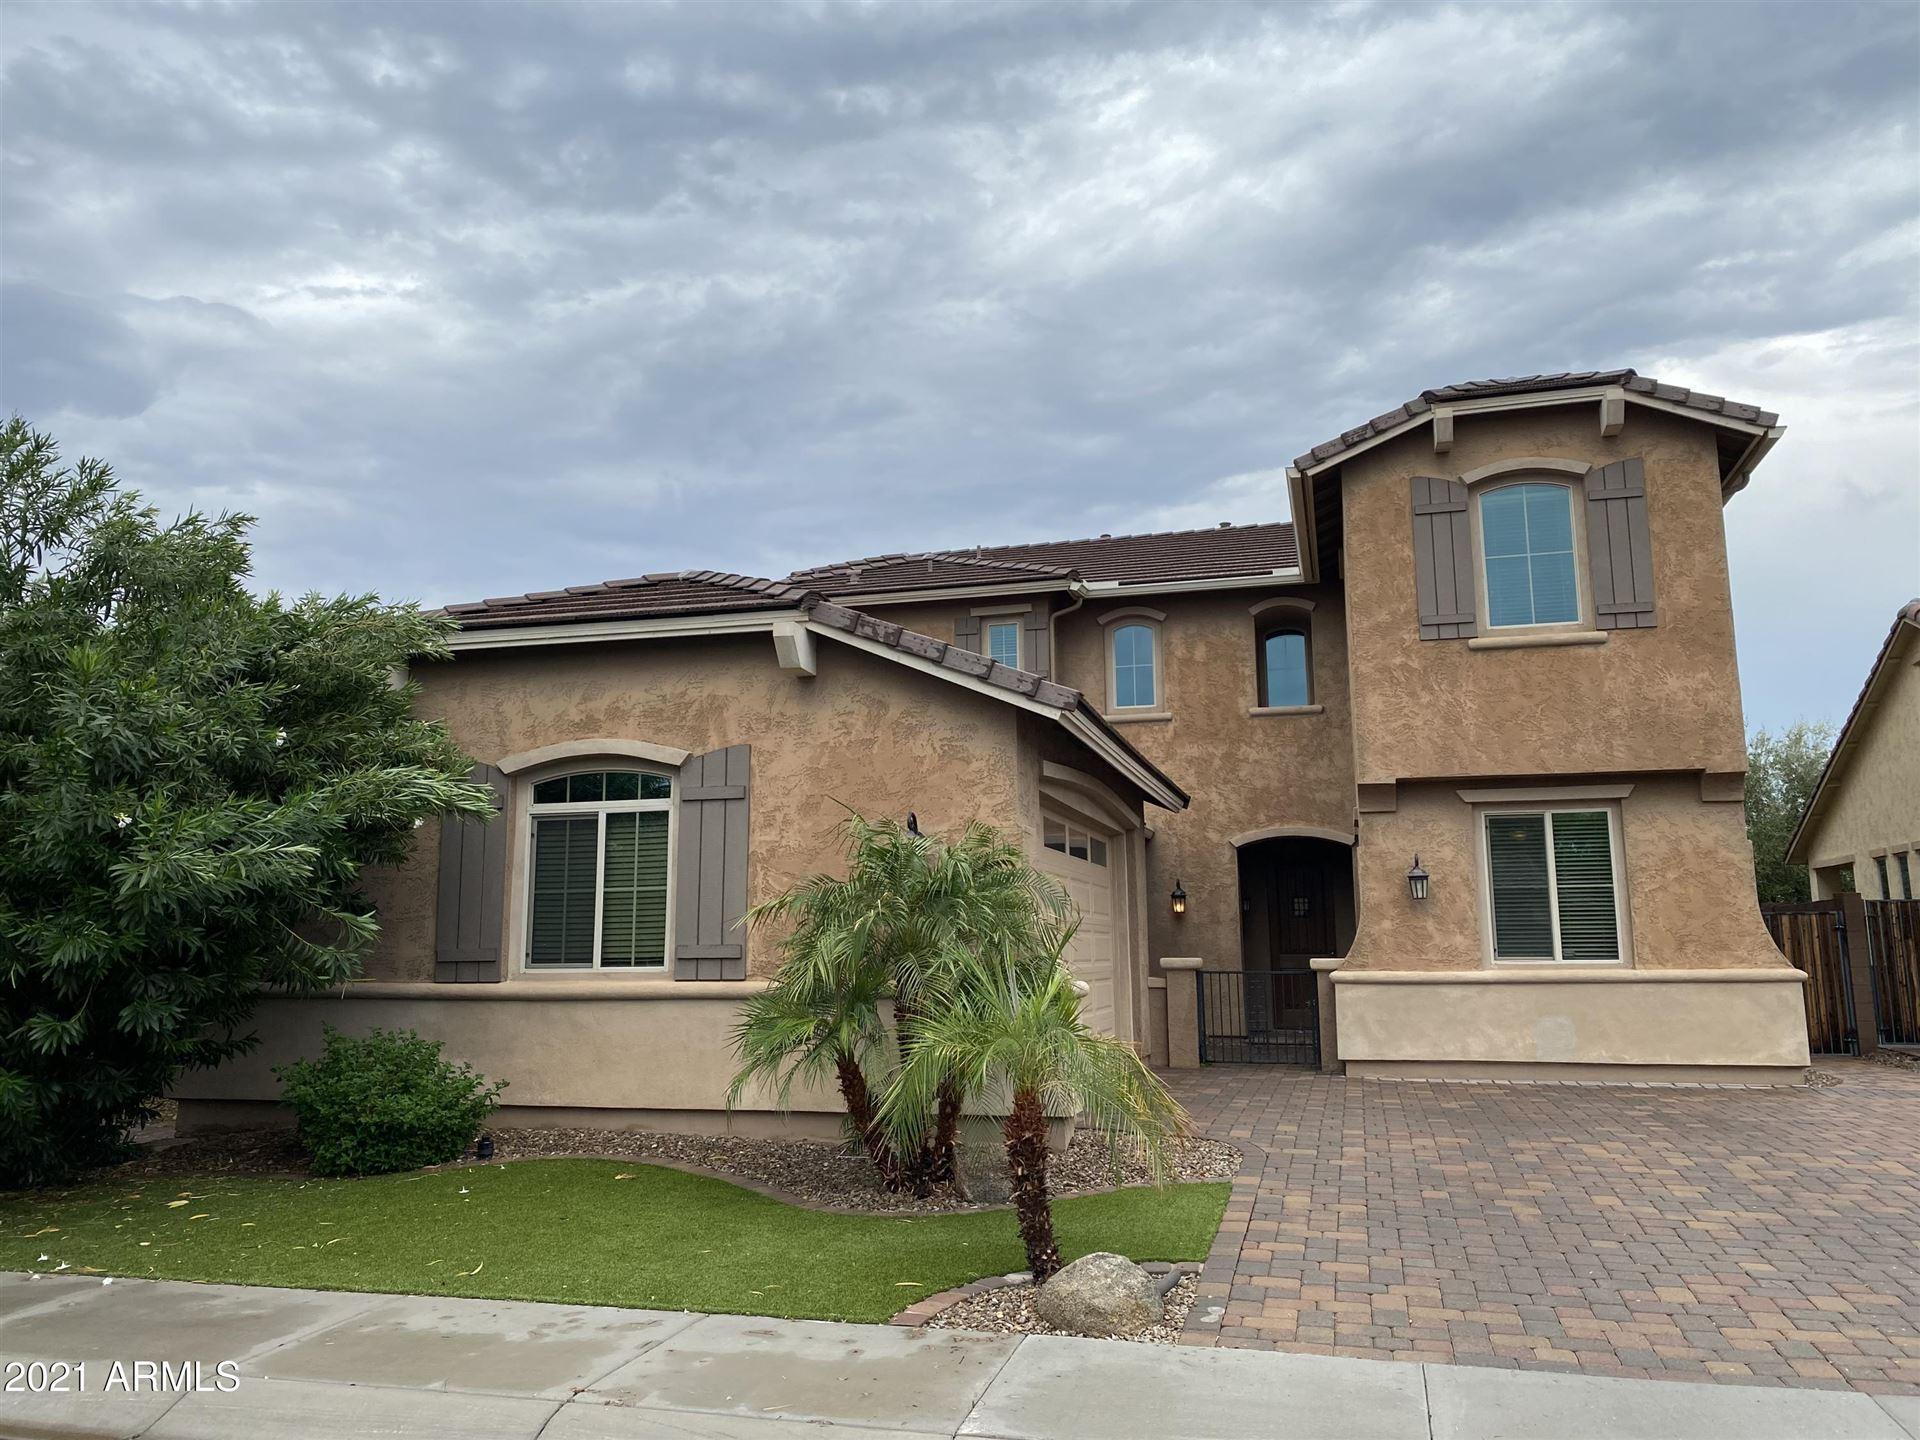 4320 S JASMINE Drive, Chandler, AZ 85249 - MLS#: 6269352